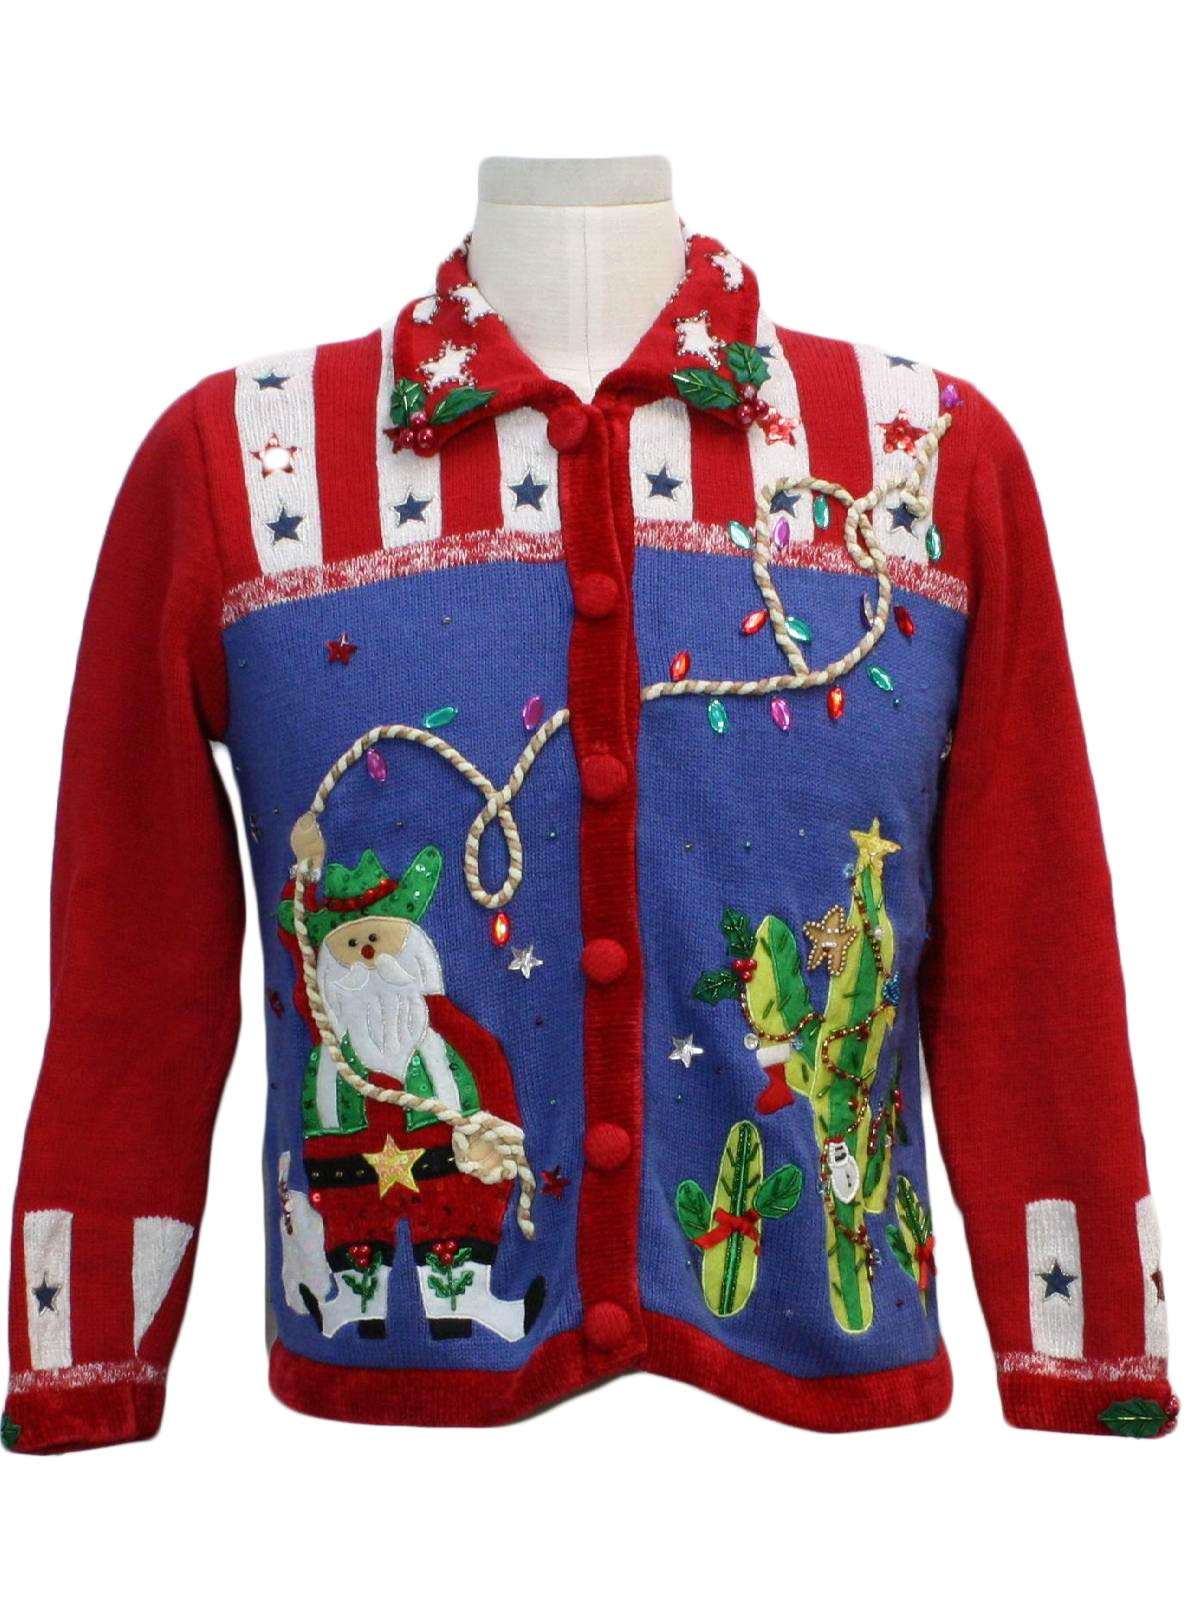 Patriotic Christmas Background.Berek Womens Western Themed Patriotic Ugly Christmas Sweater